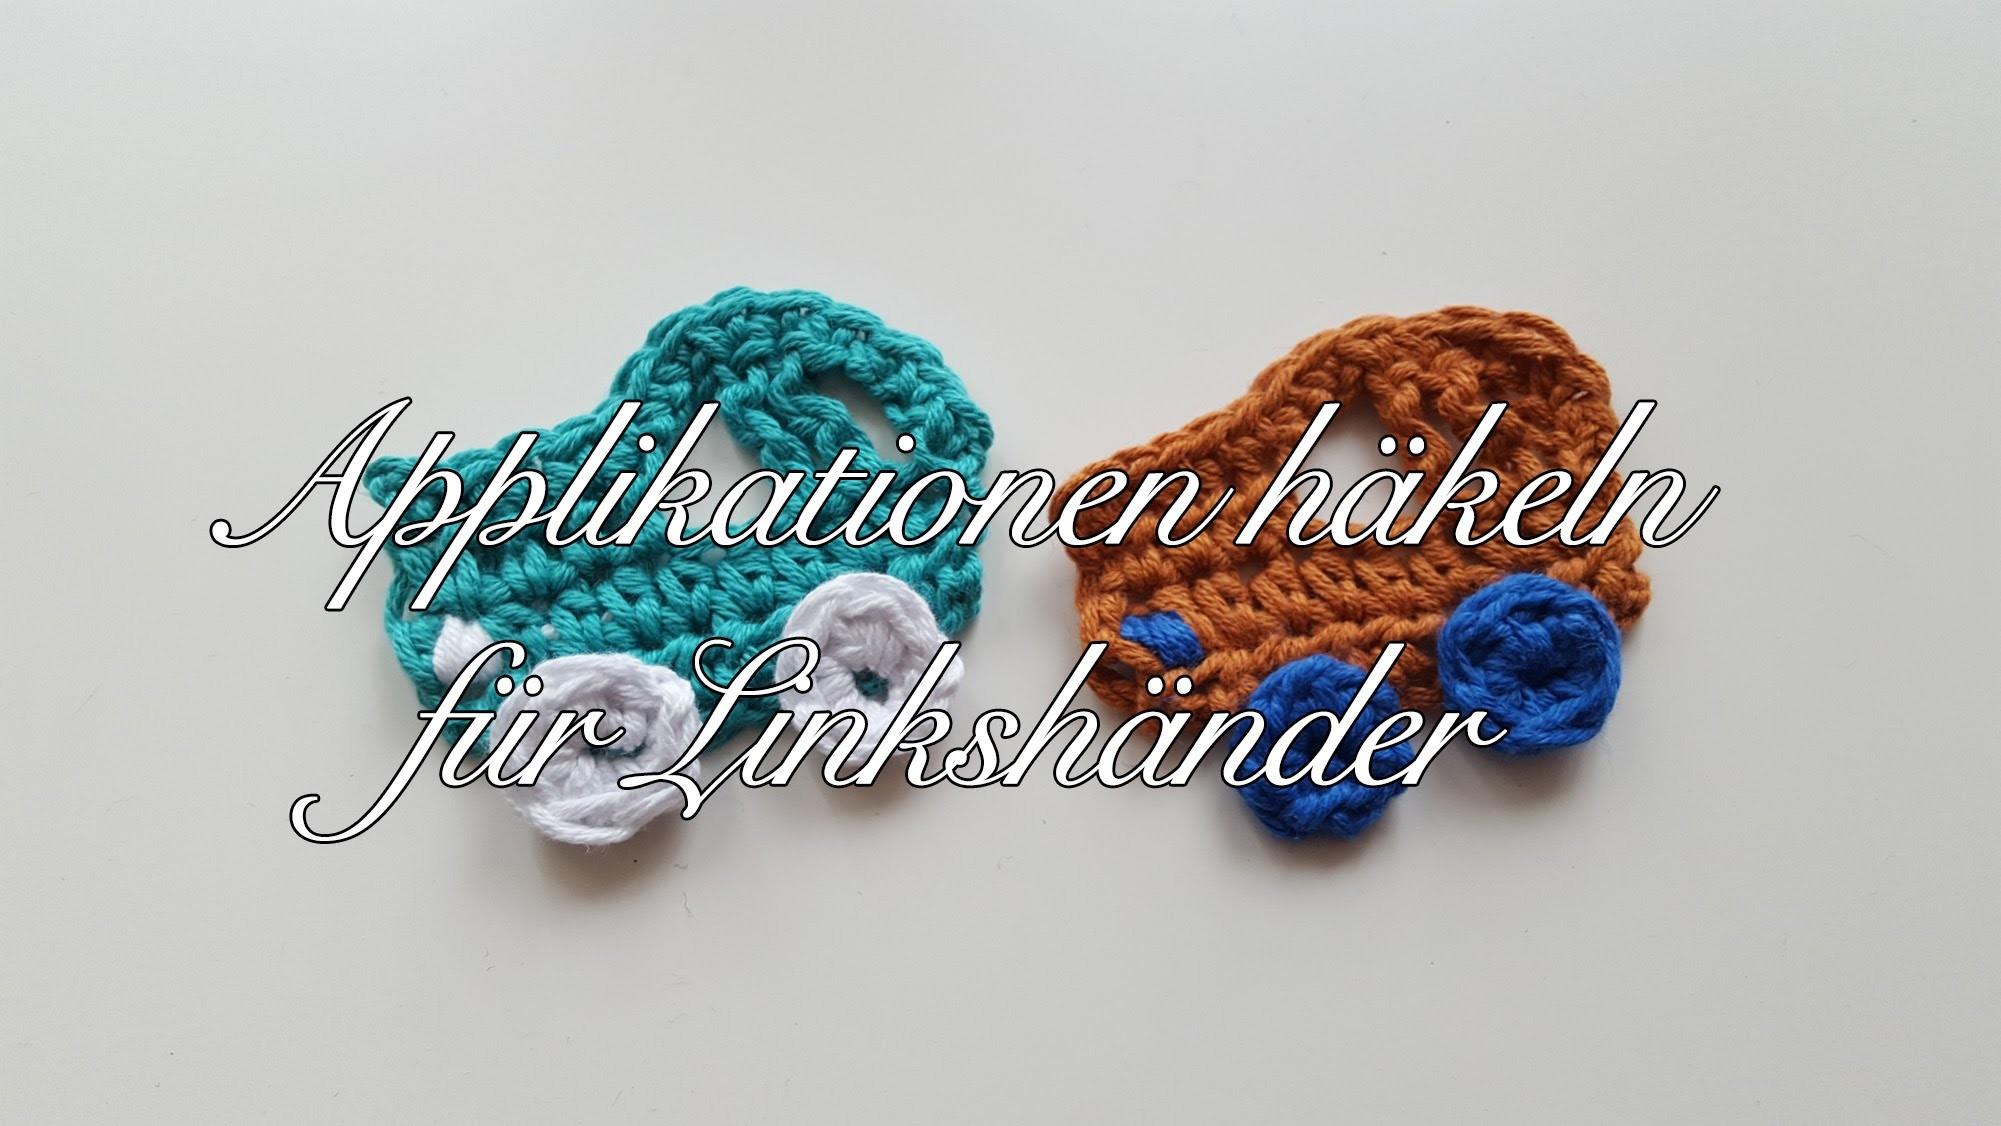 Auto Häkeln Anleitung Kostenlos 28 Images Anleitung Babyschuhe H